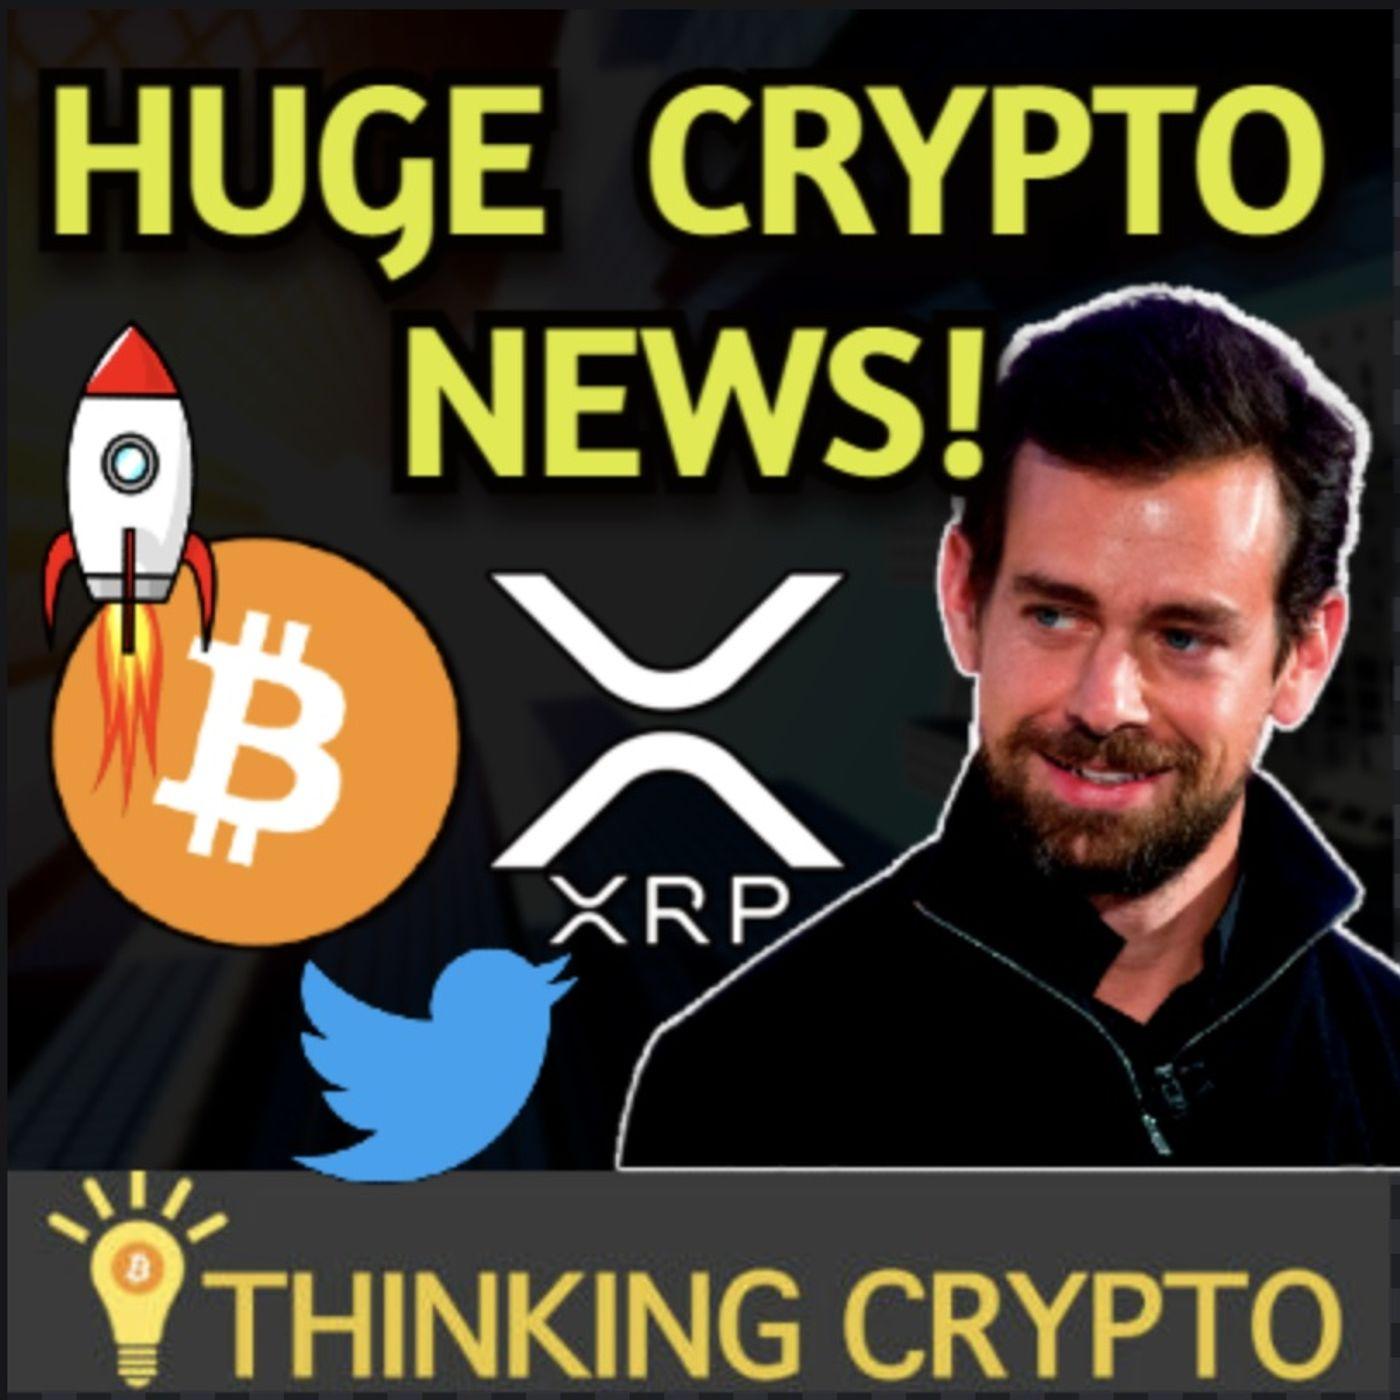 Bitcoin in 401Ks - Jack Dorsey Lightning Network - $22.5M Property Sold For Crypto - SEC Ripple XRP